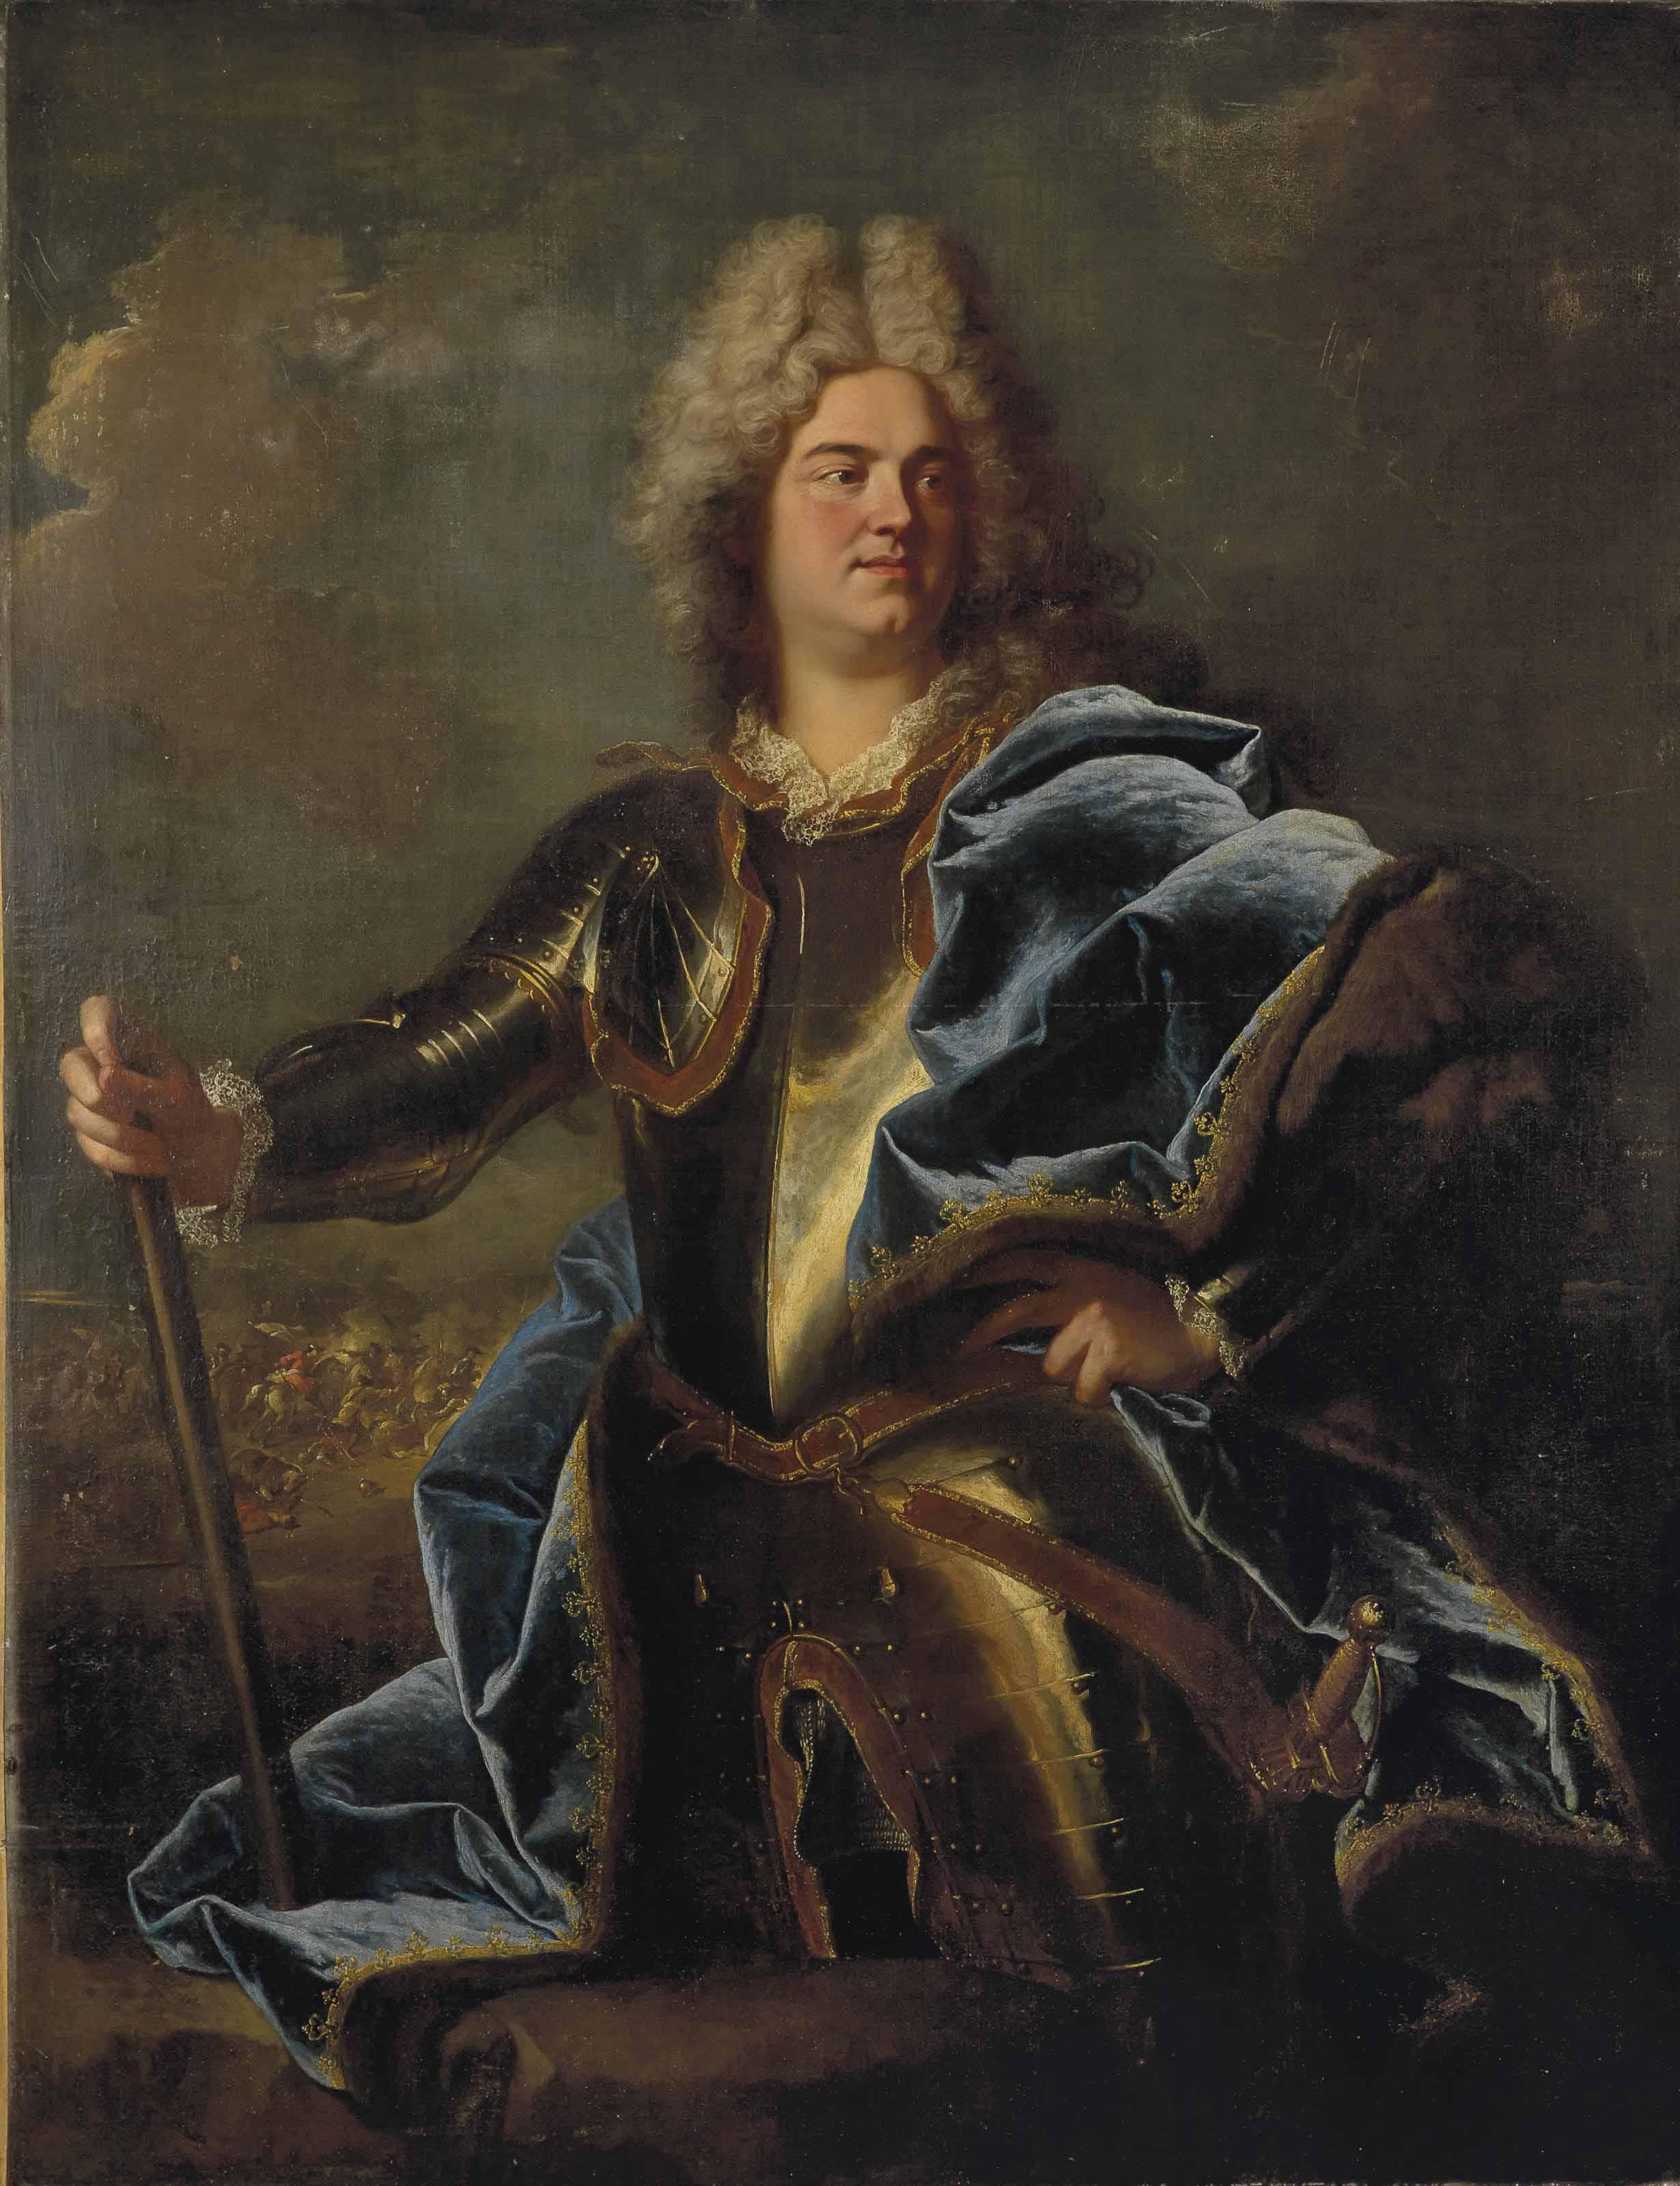 Portrait of a man, traditionally identified as Claude Louis Hector, duc de Villars (1653-1734)